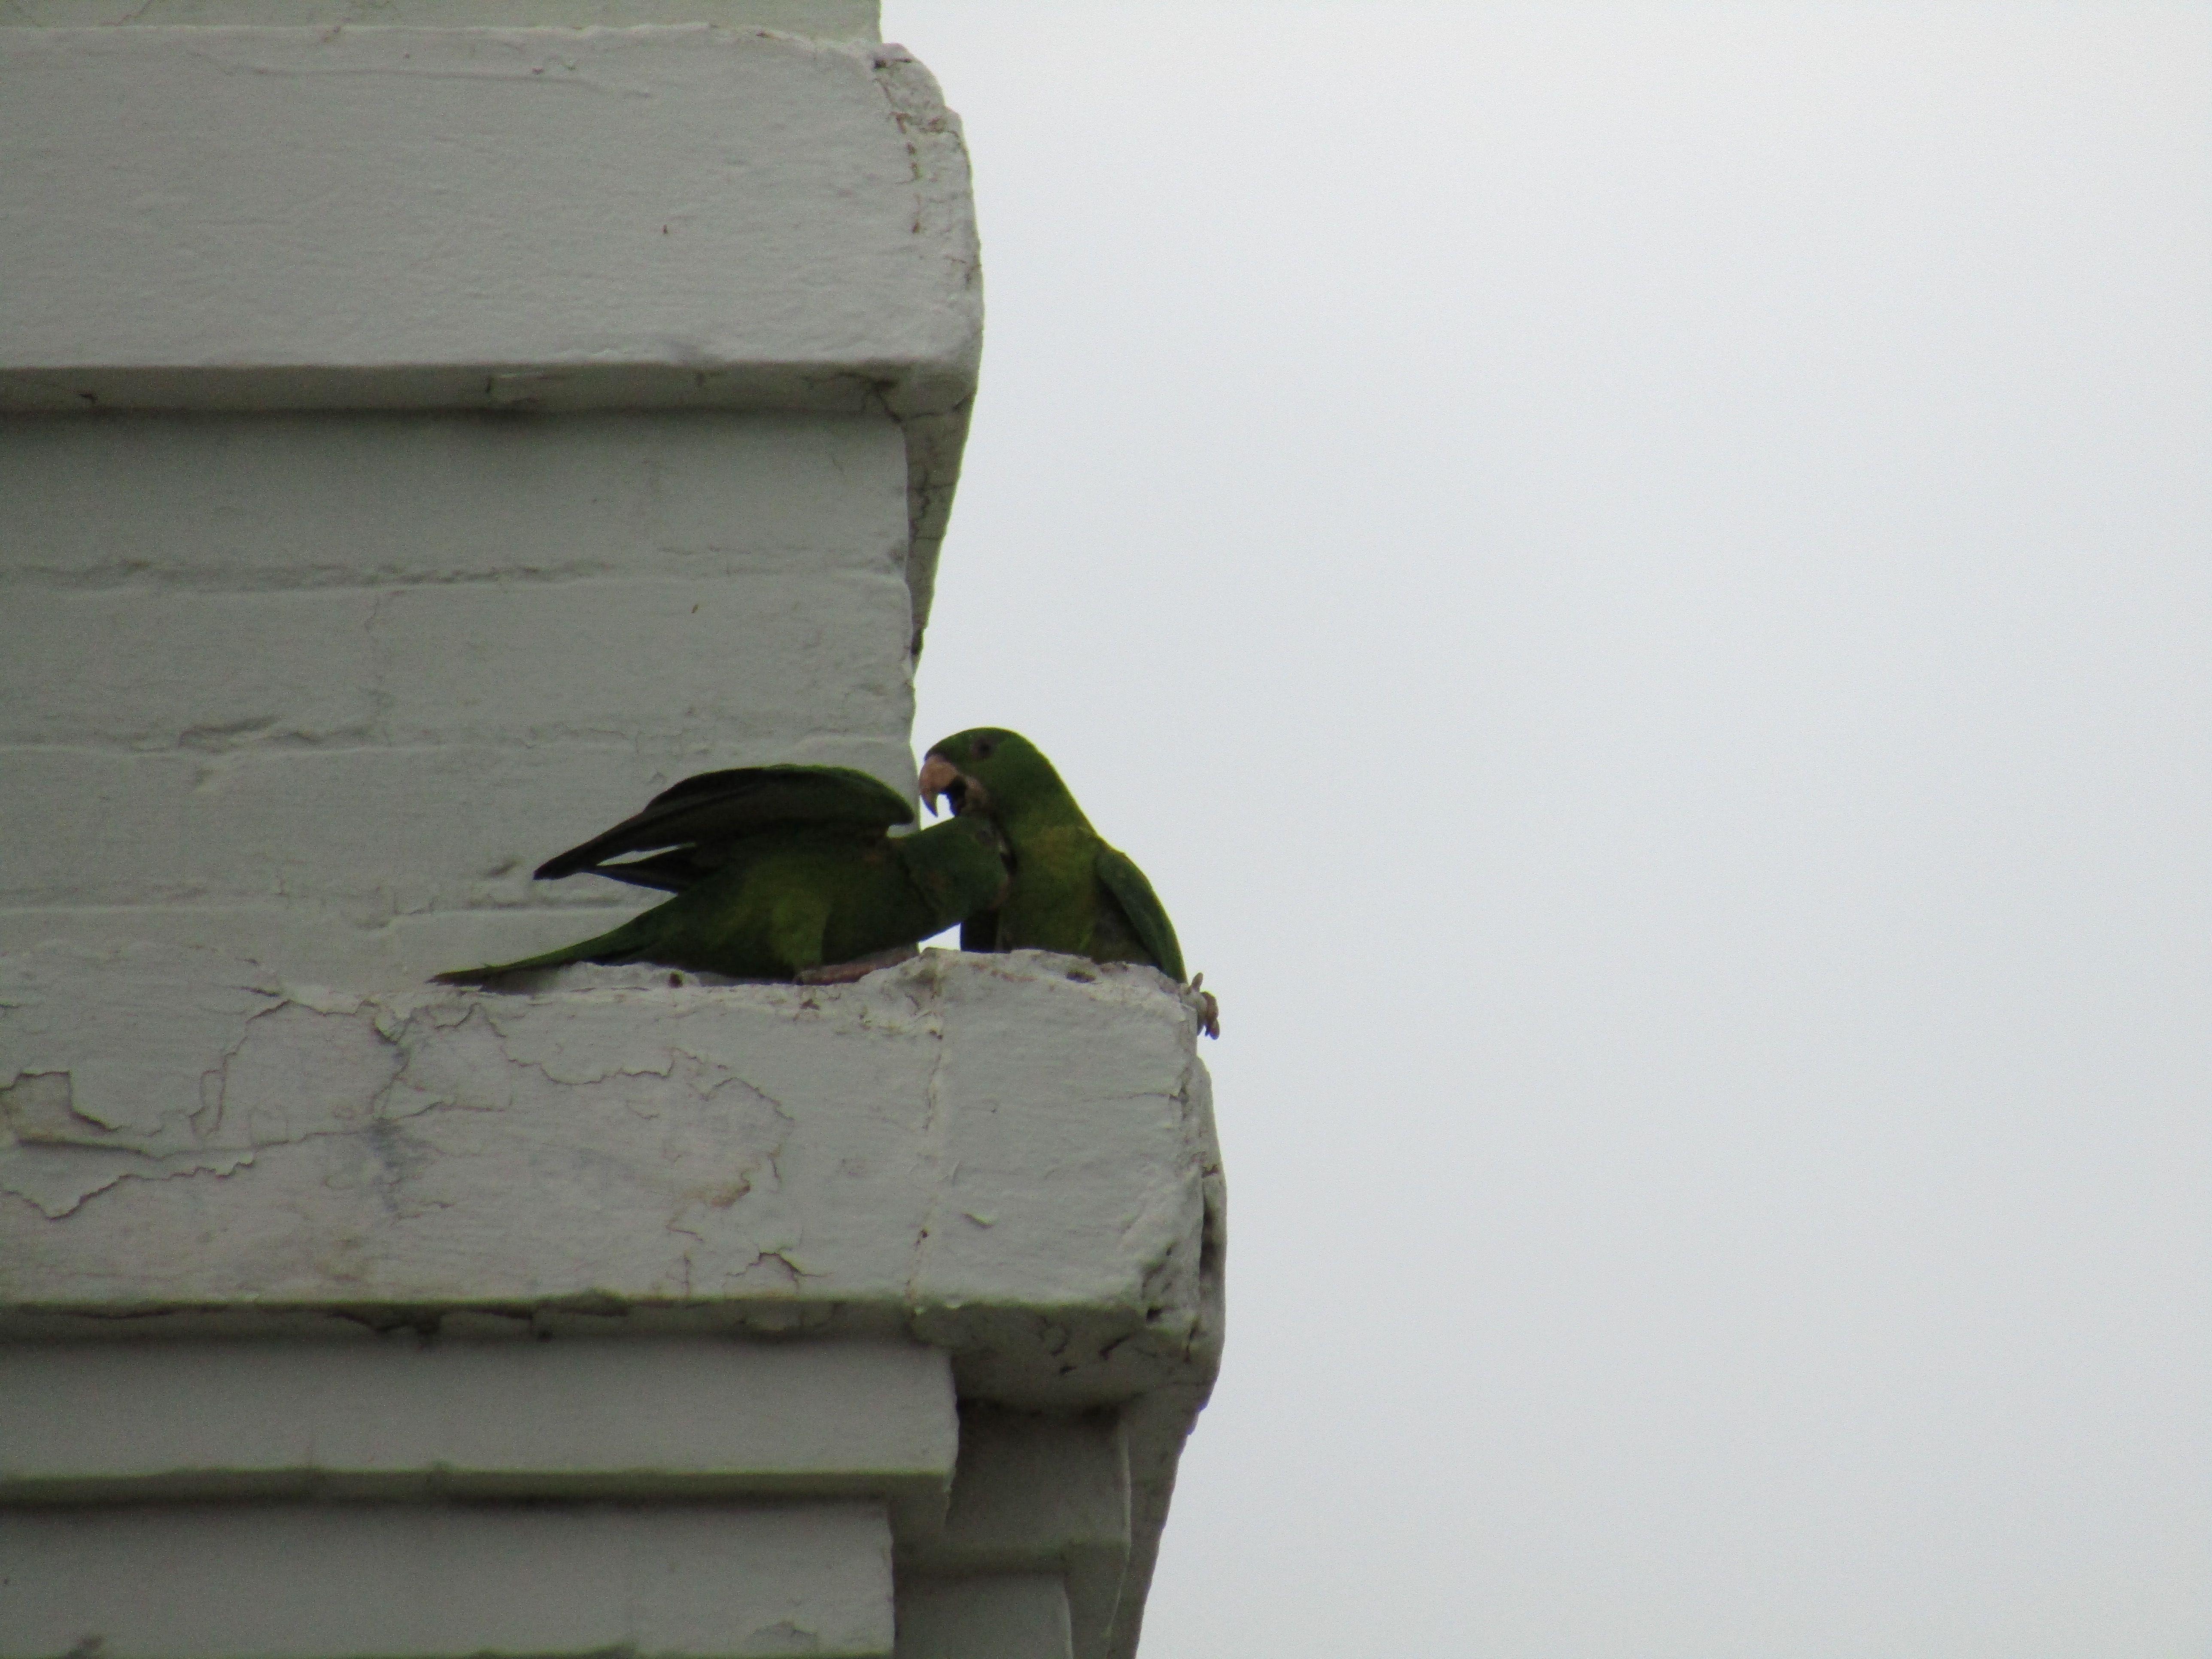 Parrots in love in downtown laredo laredo texas el